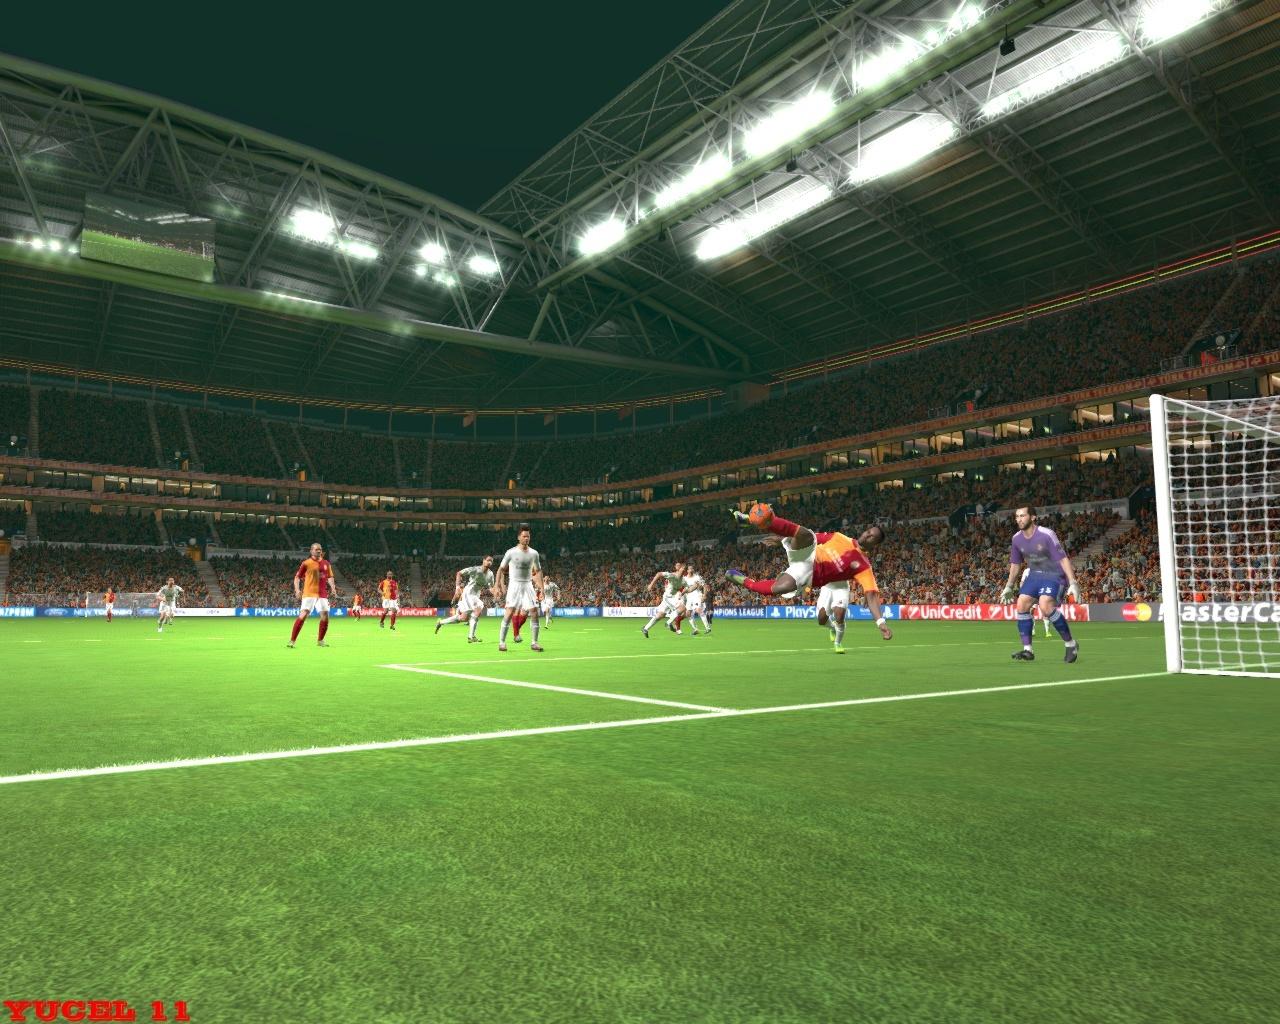 Turk Telekom Arena by Yucel11